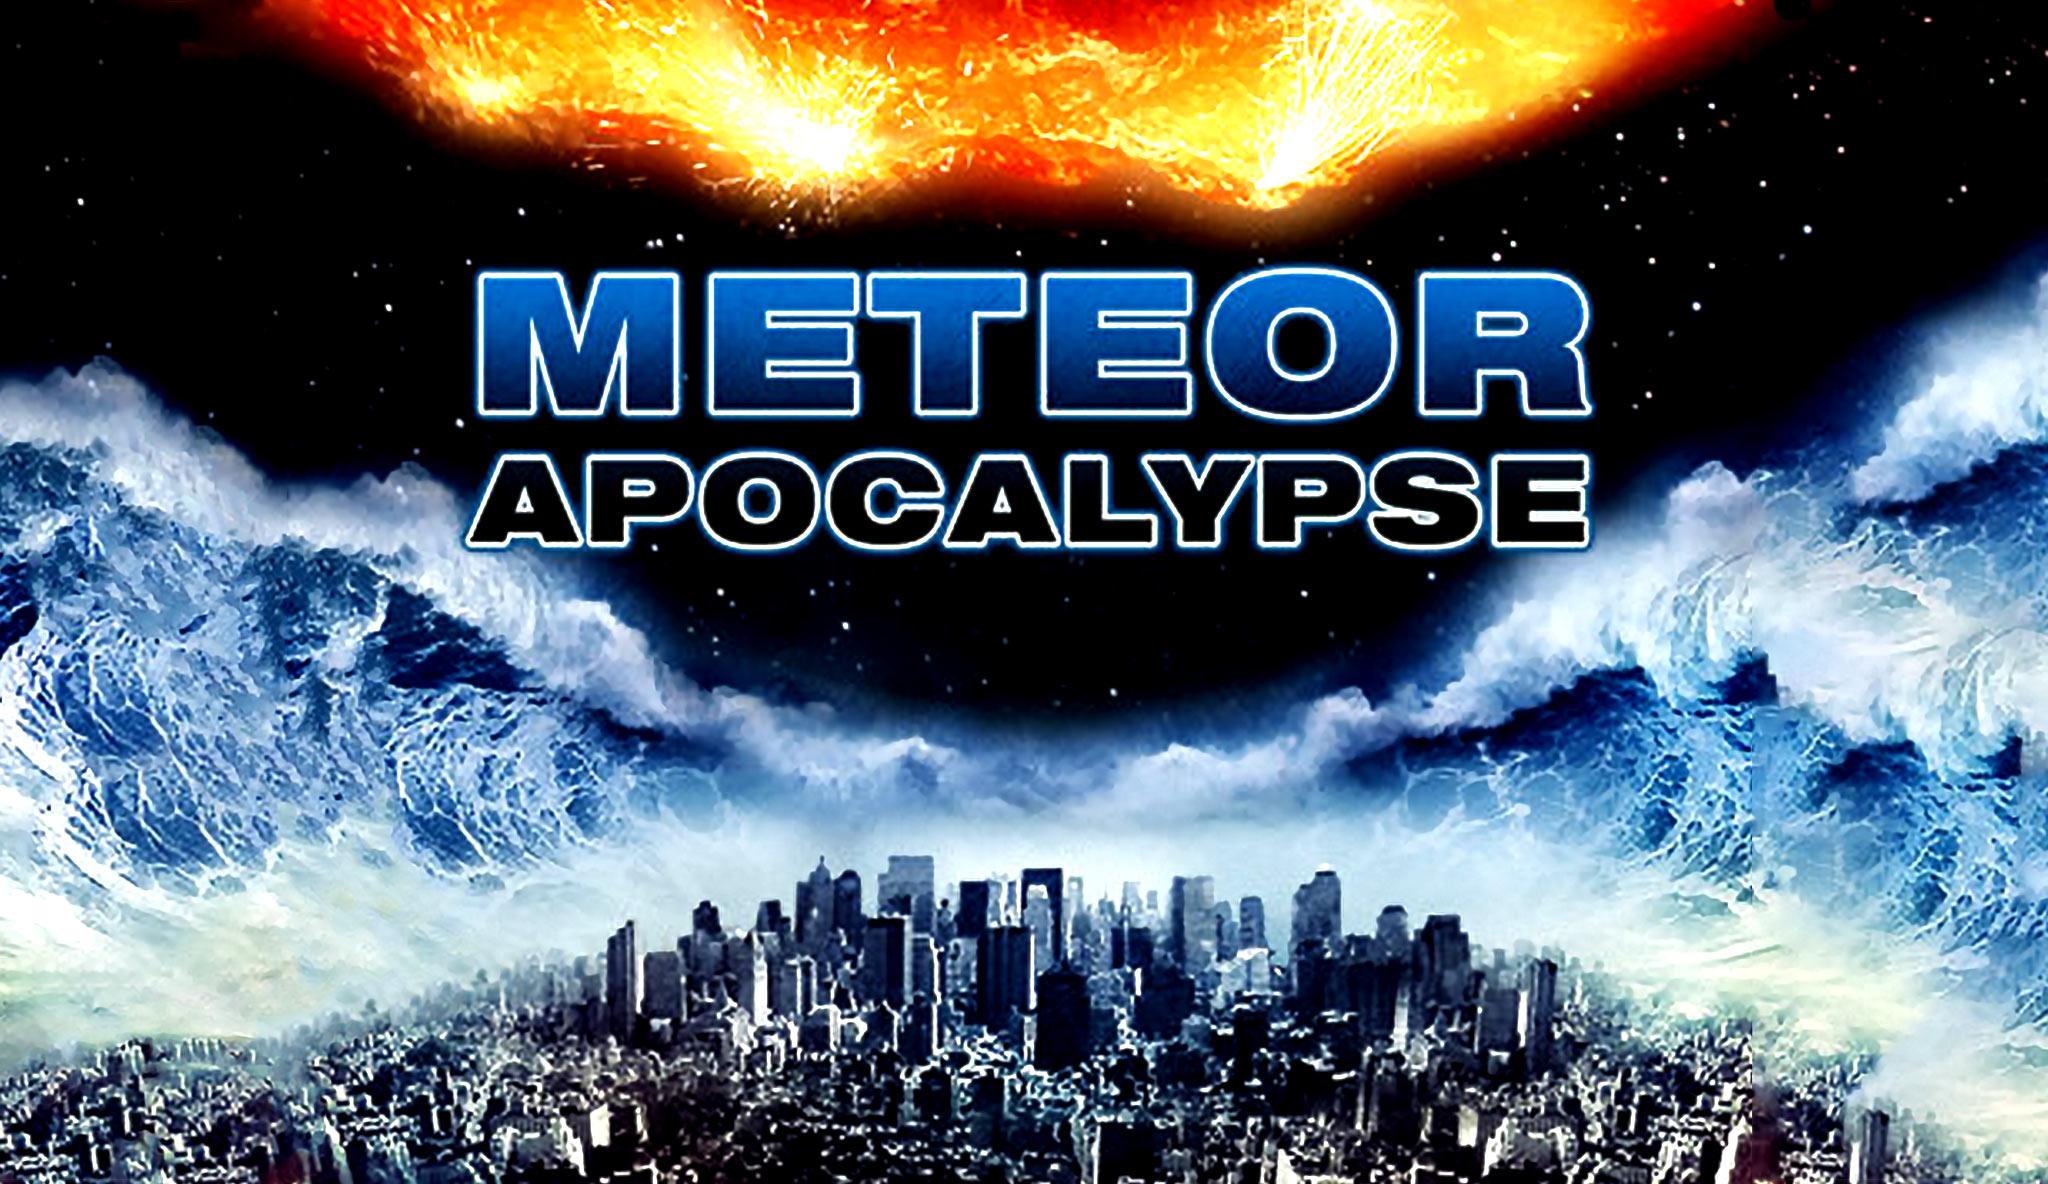 meteor-apocalypse\header.jpg